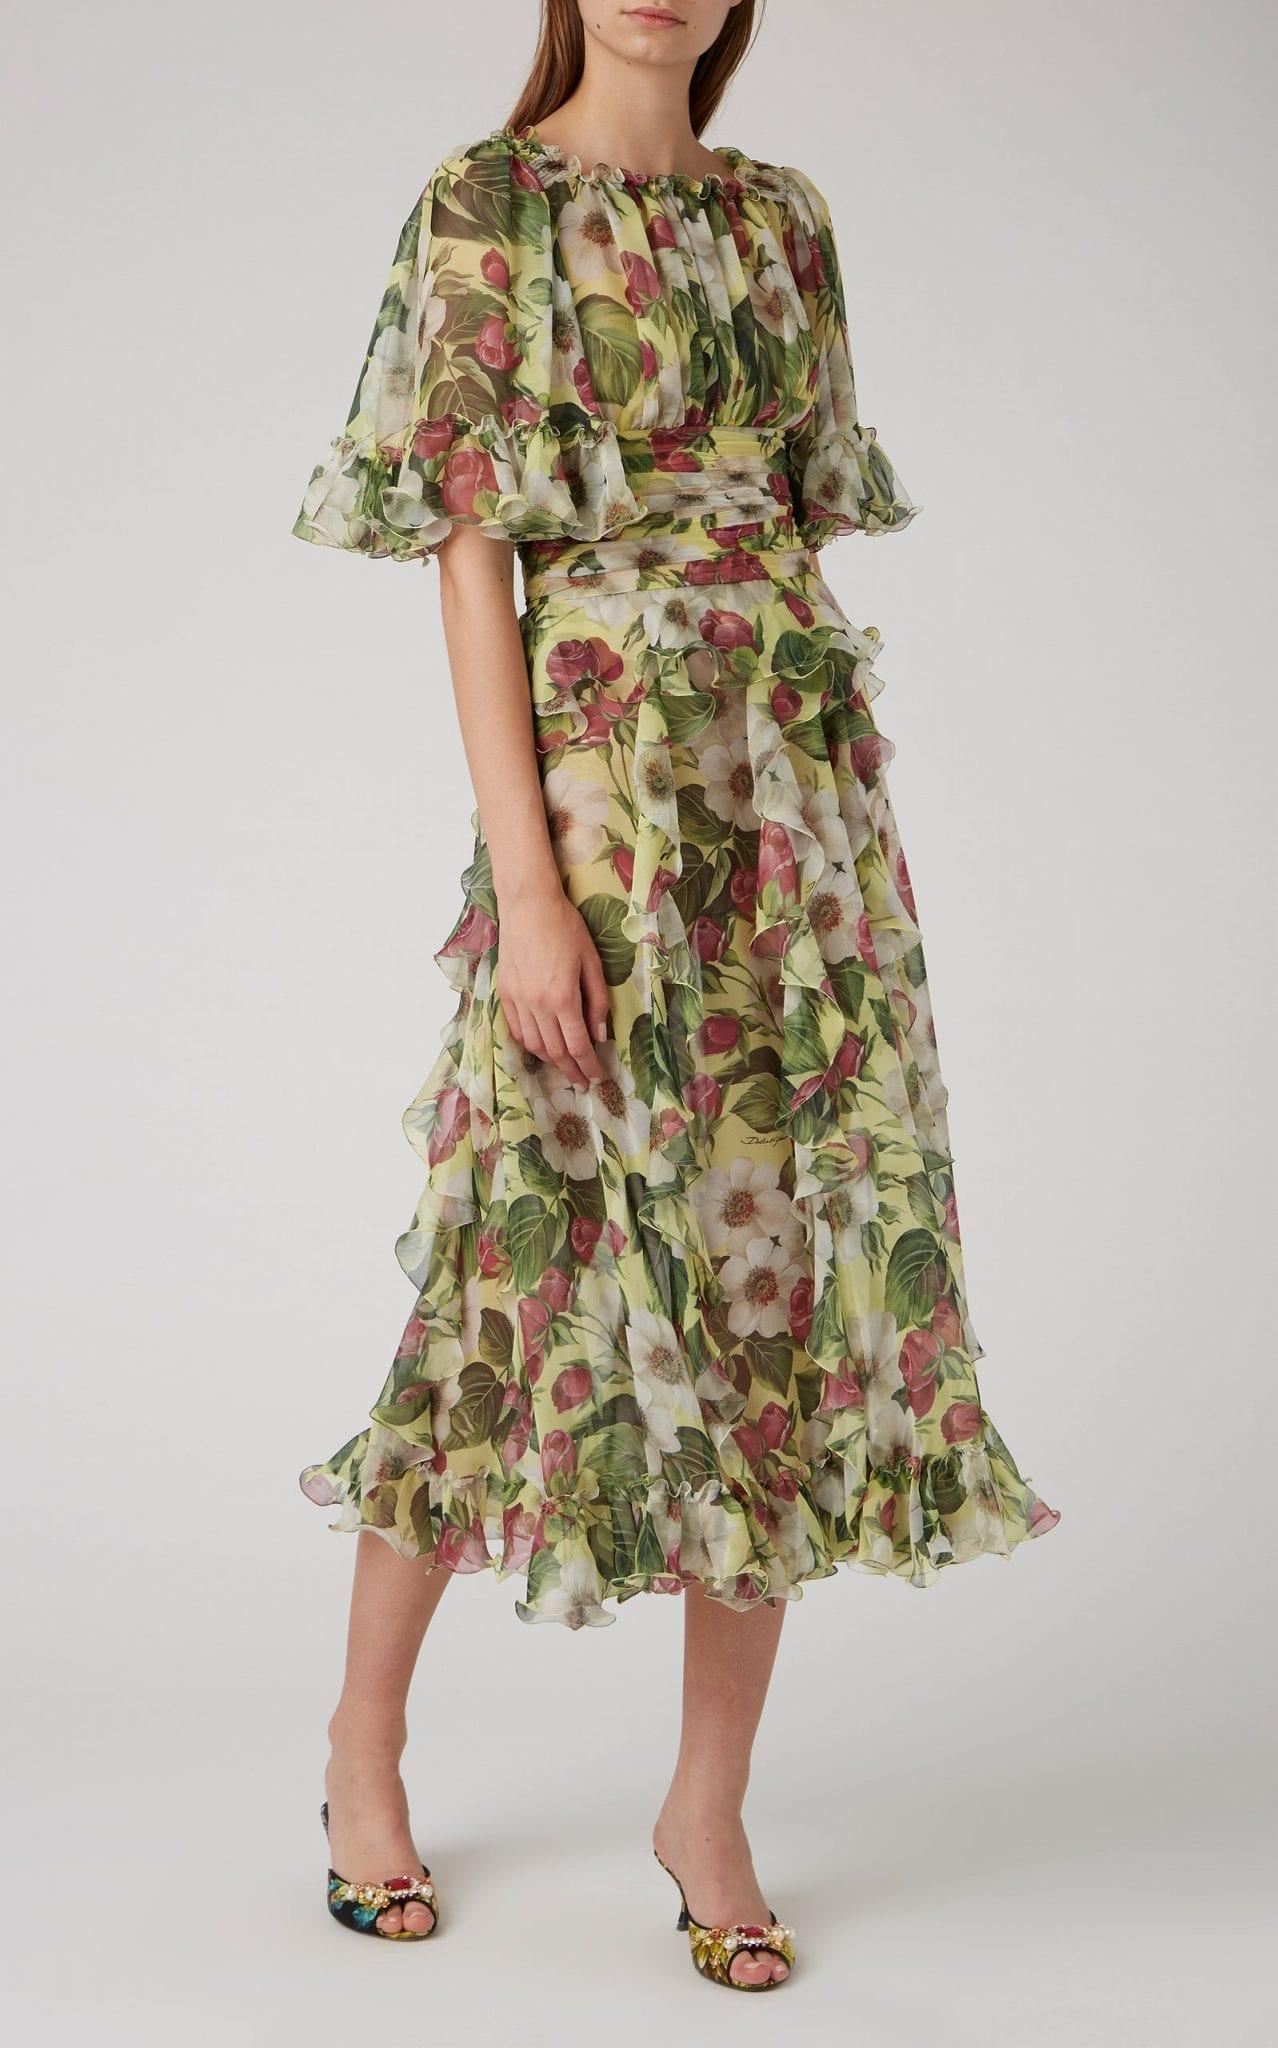 DOLCE & GABBANA Ruffled Floral-Print Silk Midi Dress